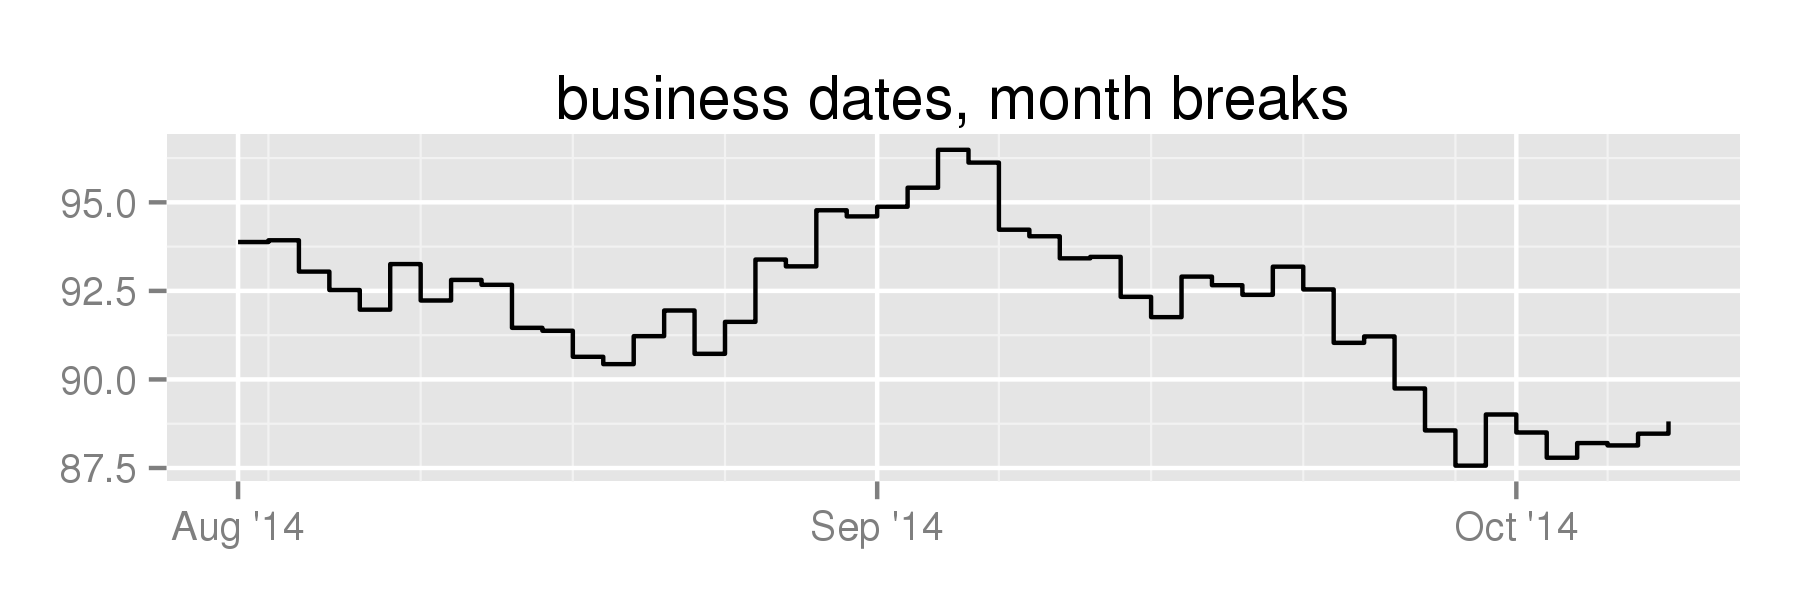 business dates, month breaks